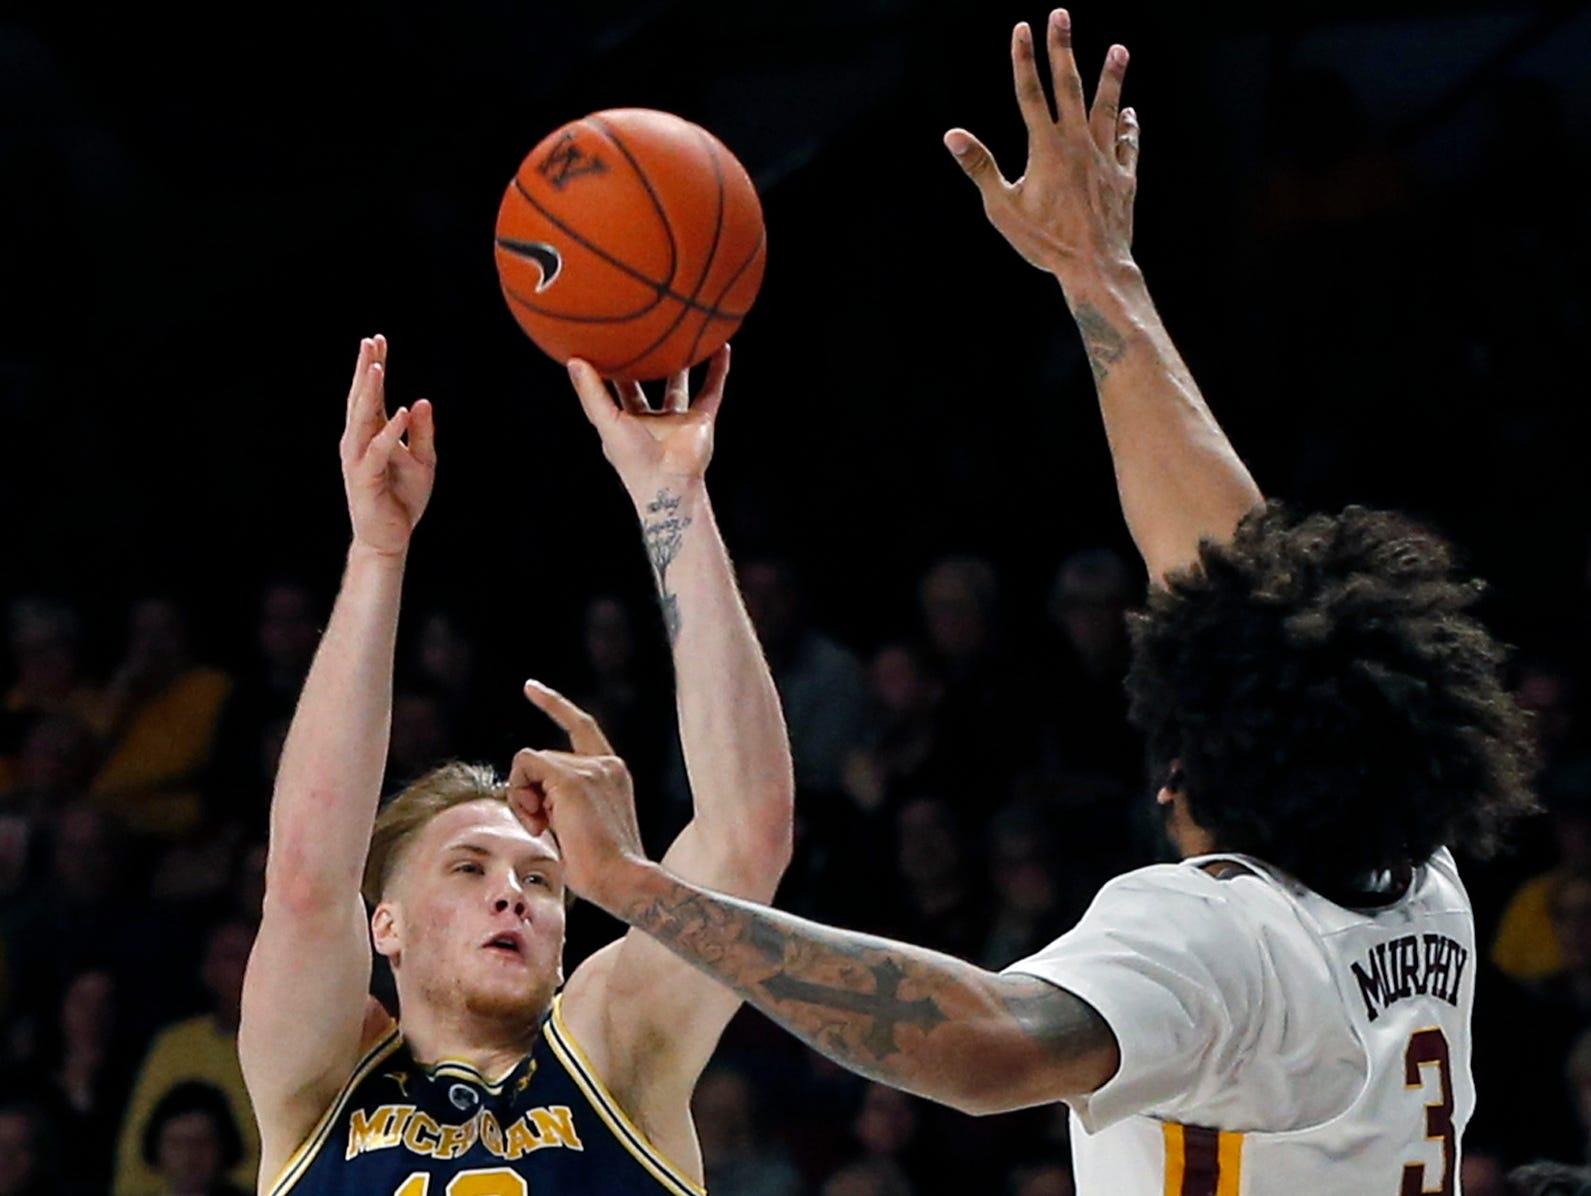 Michigan's Ignas Brazdeikis, left, shoots over Minnesota's Jordan Murphy in the second half of an NCAA college basketball game Thursday, Feb. 21, 2019, in Minneapolis. Michigan defeated Minnesota 69-60.